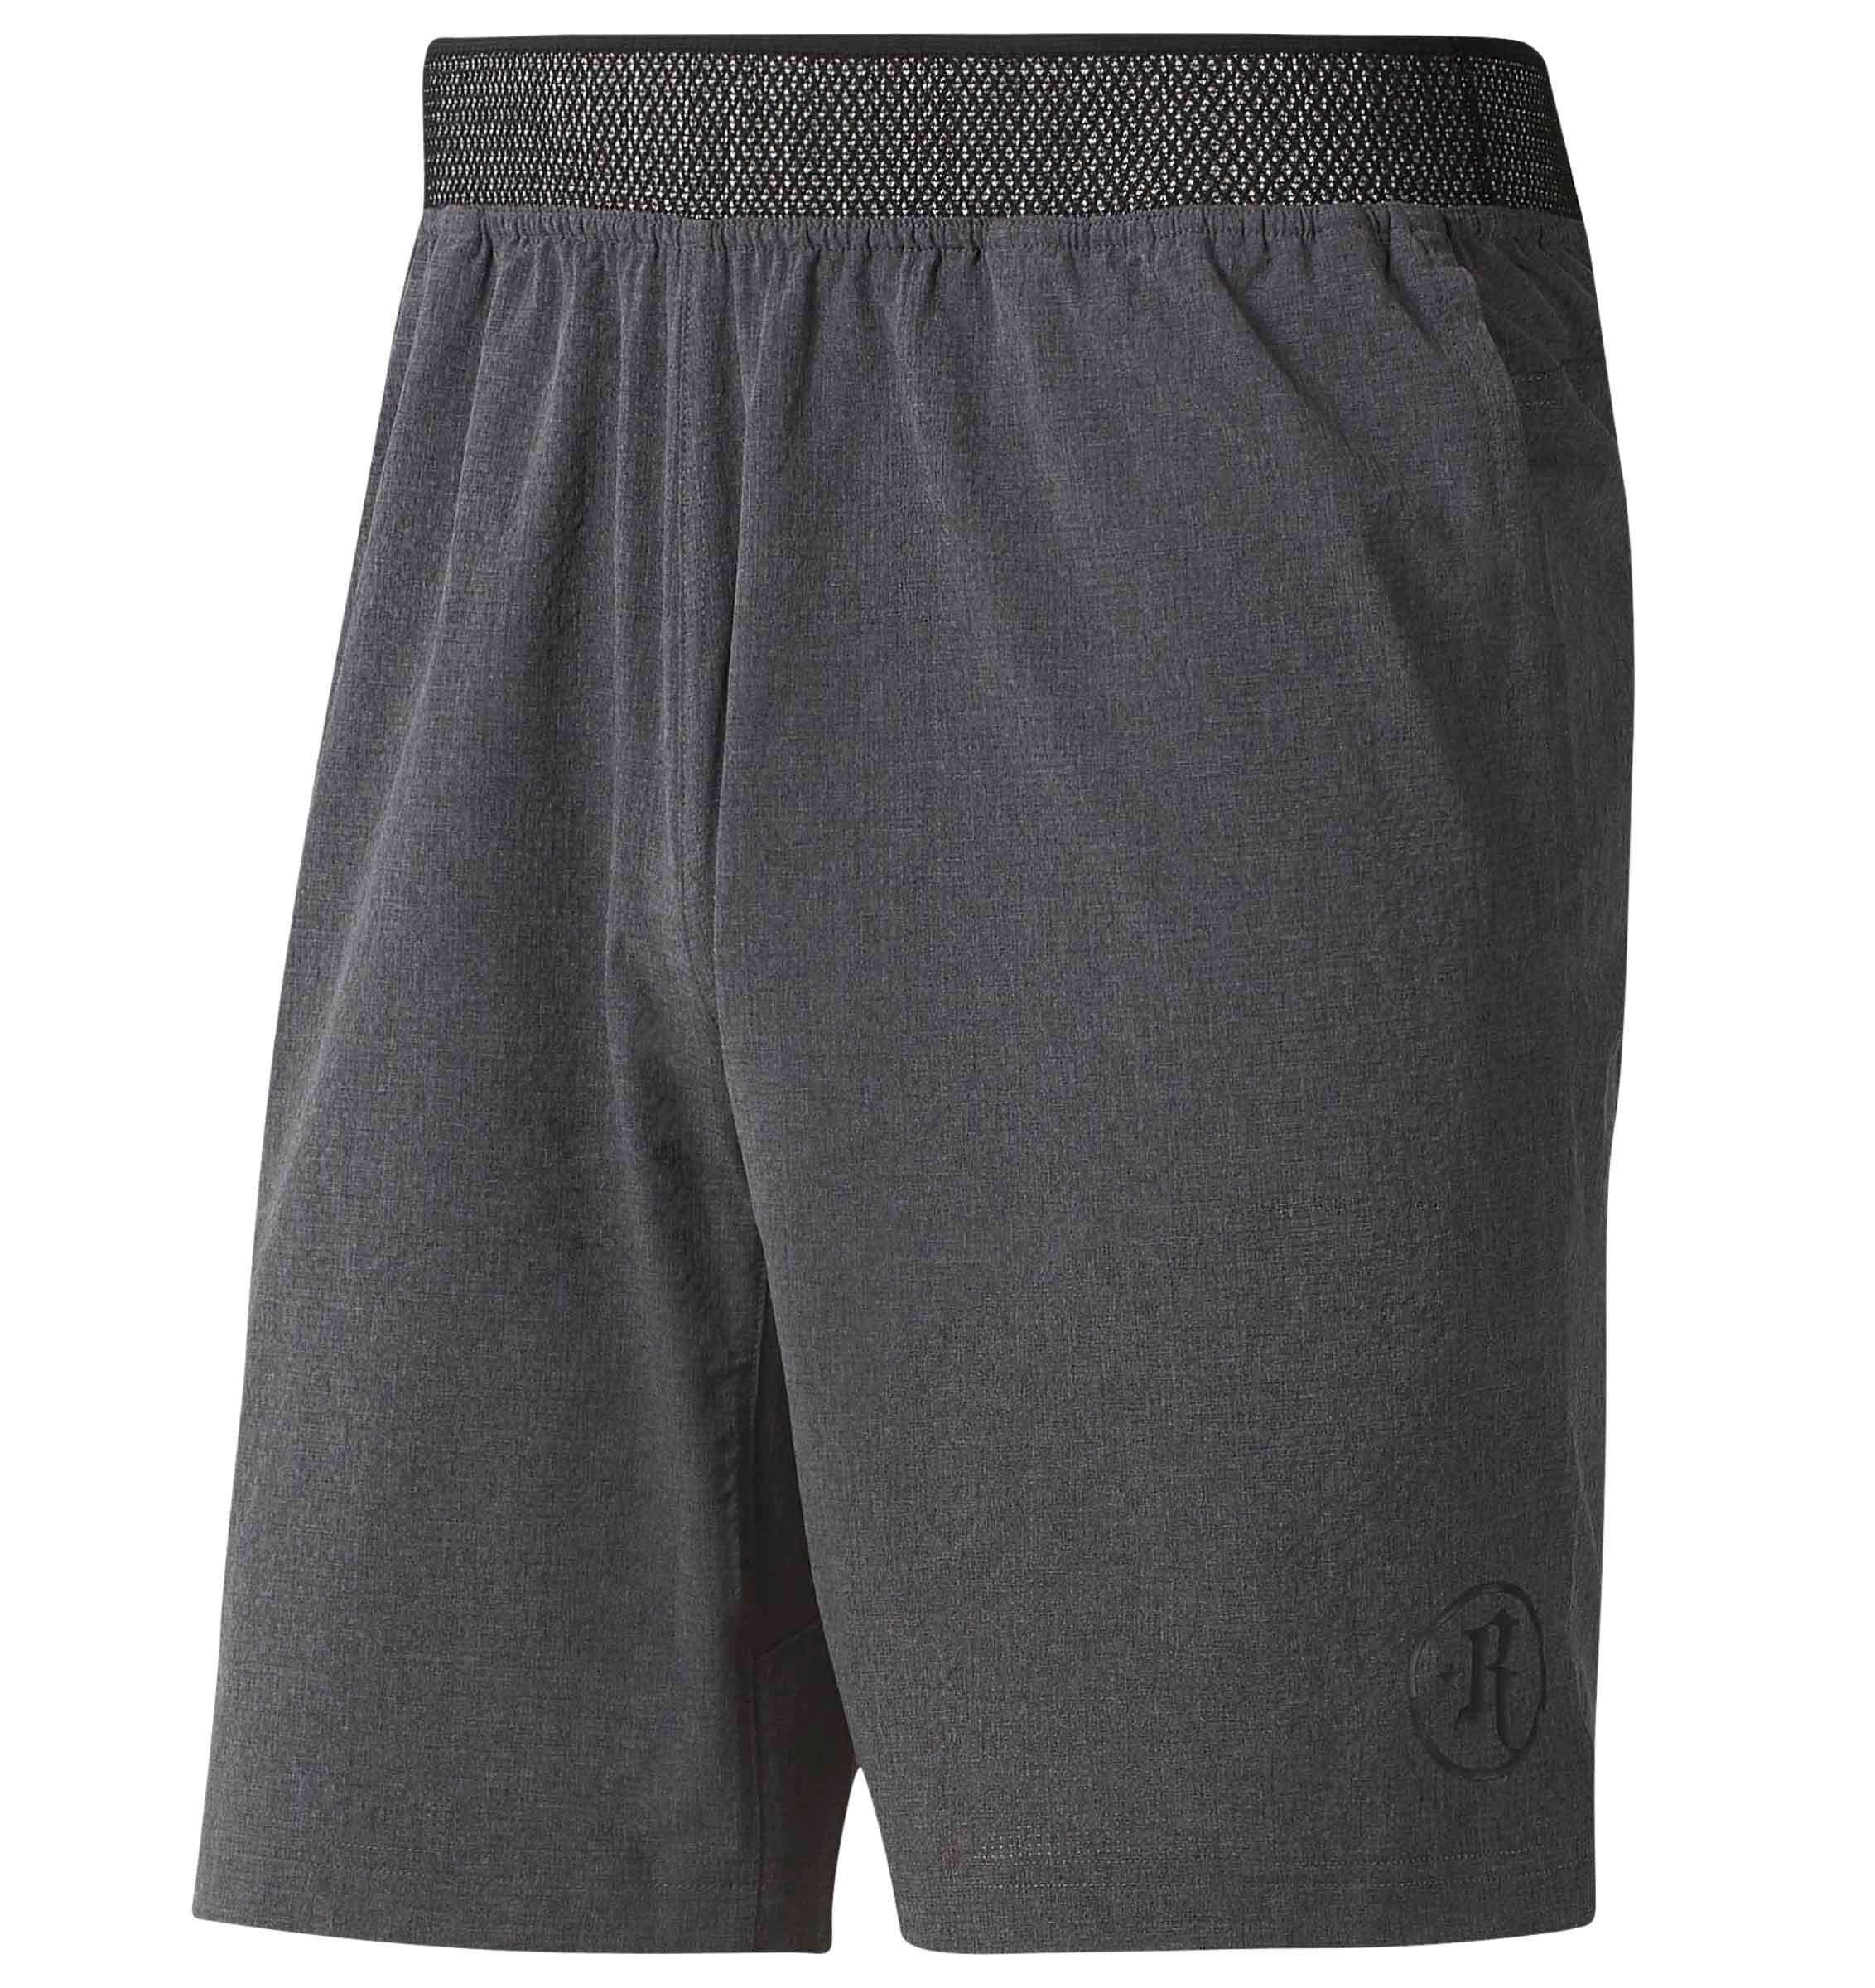 crossfit-shorts-froning